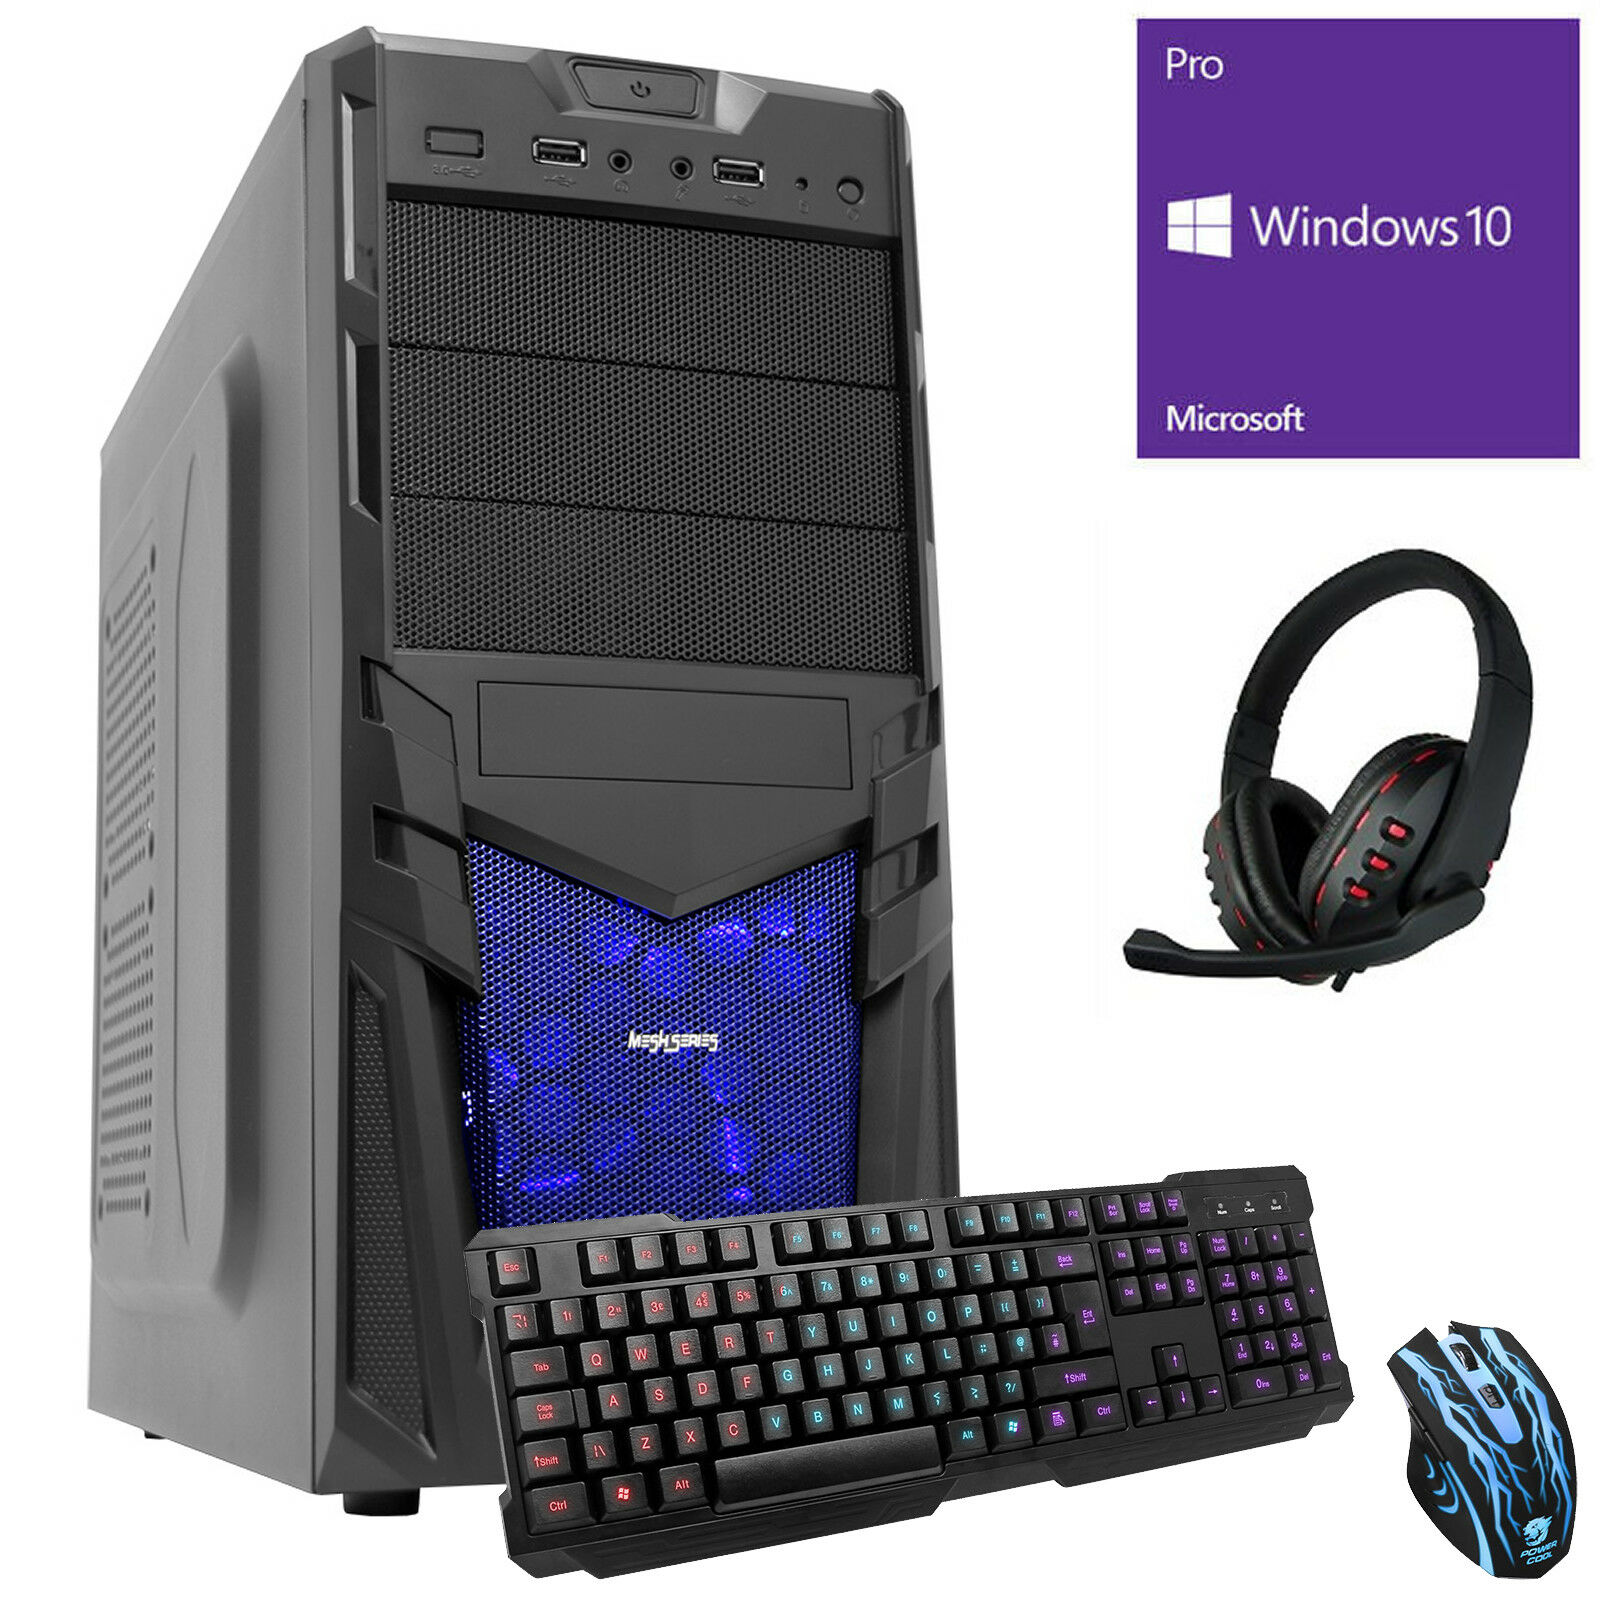 Computer Games - ULTRA FAST 3.9 QUAD CORE 8GB 1TB Desktop Gaming PC Computer Bundle9 Windows 10 V